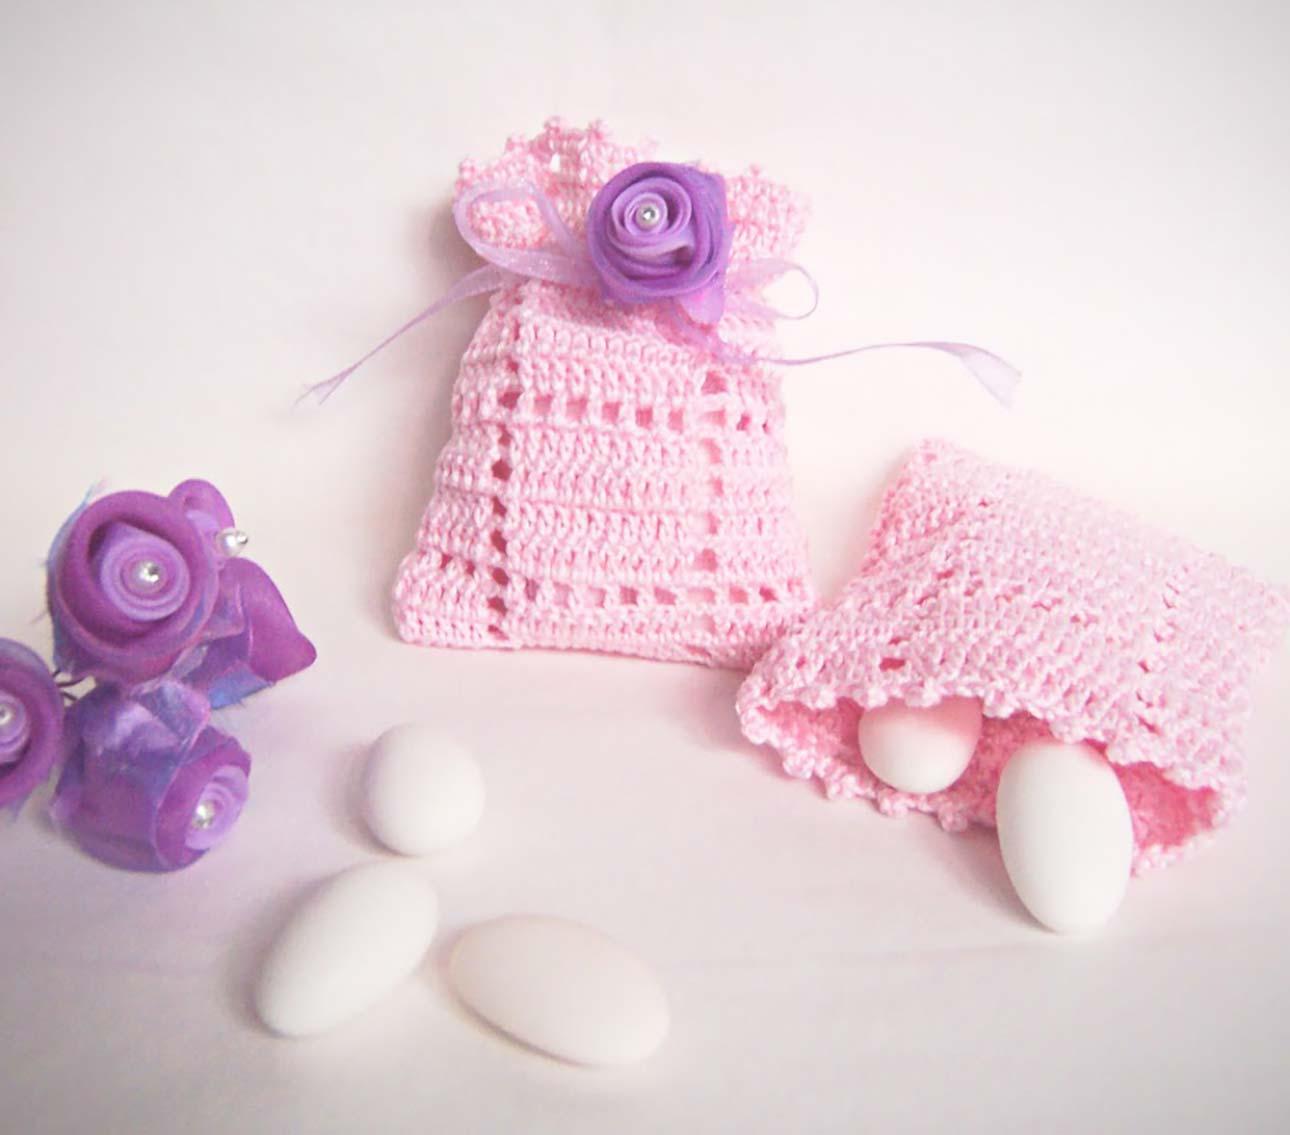 bomboniere sacchetti uncinetto rosa battesimo bimba